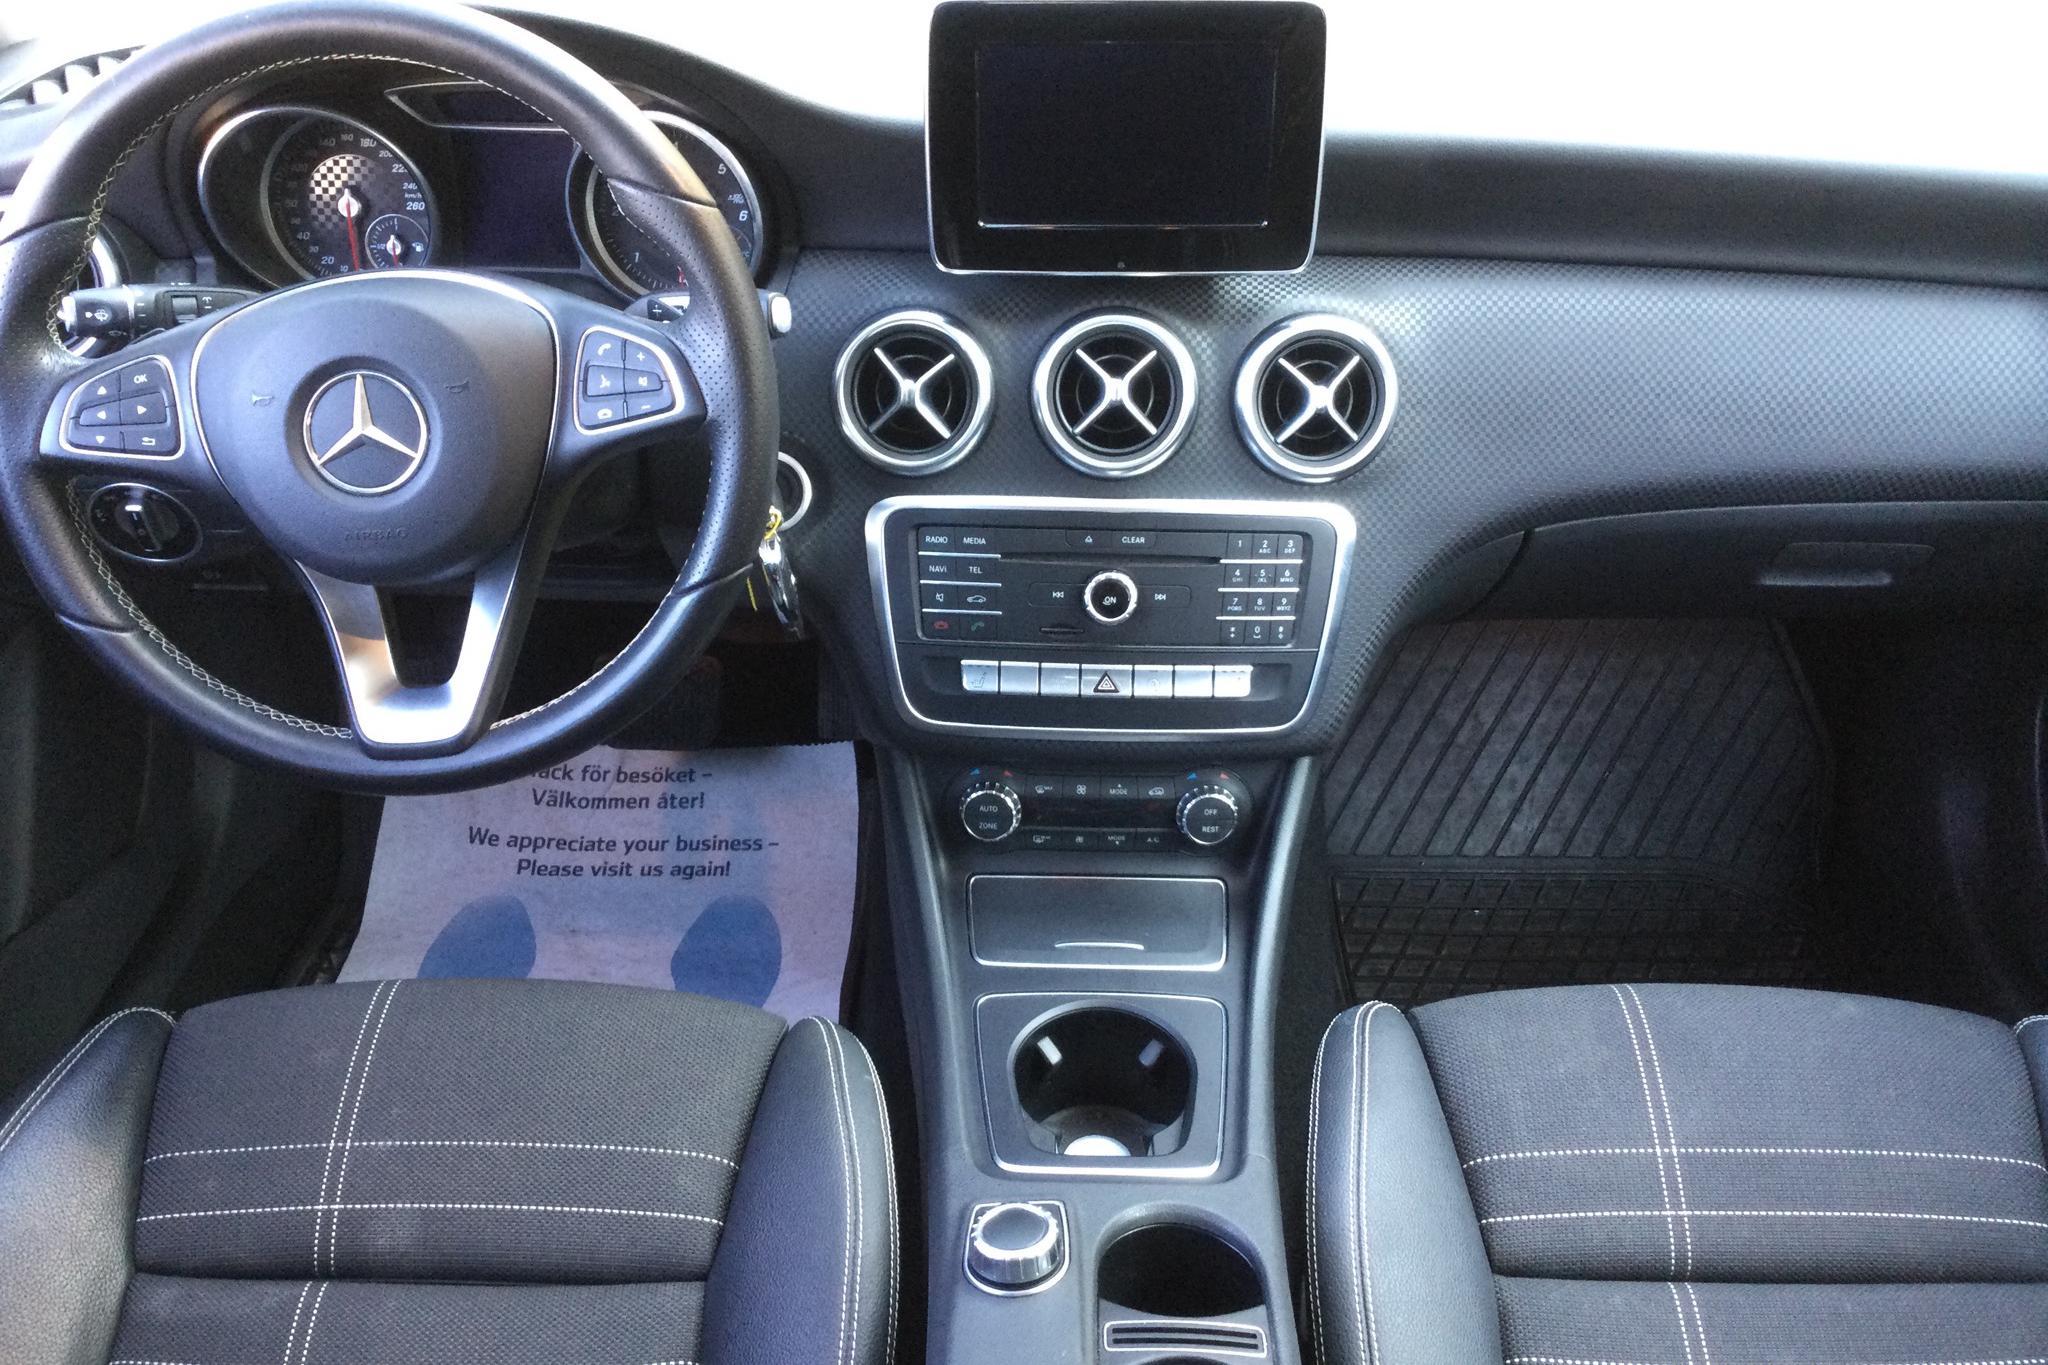 Mercedes A 200 d 4MATIC 5dr W176 (136hk) - 63 580 km - Automatic - Dark Grey - 2016